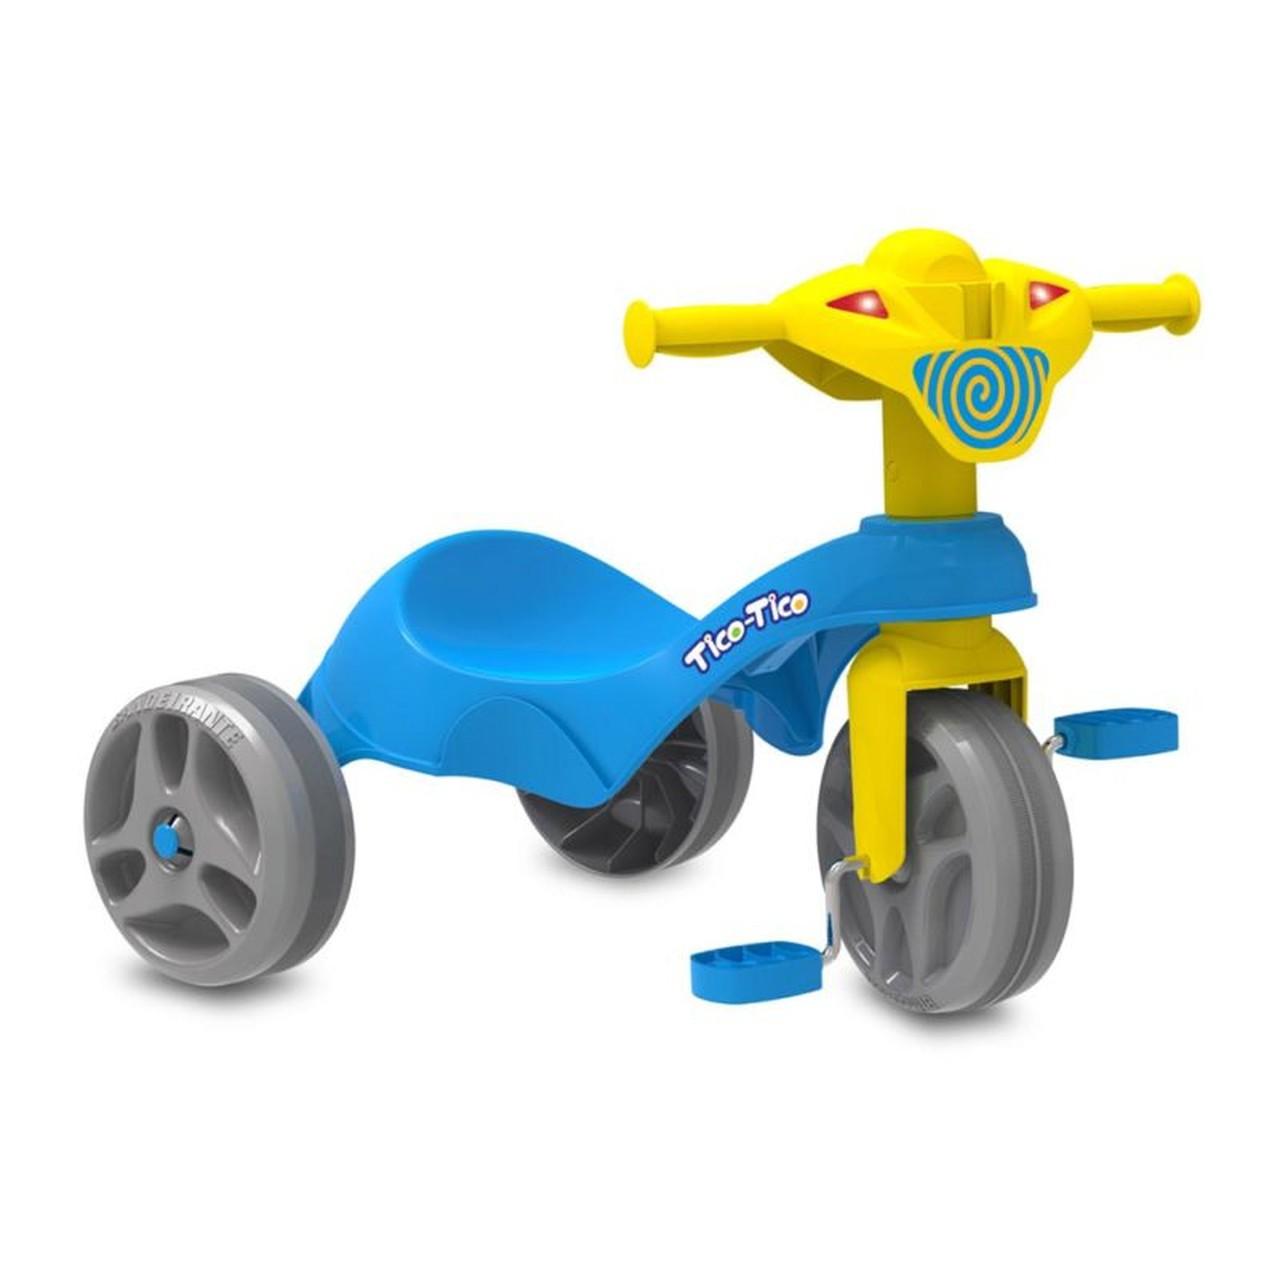 Triciclo Tico - Tico Club Azul - Bandeirante 684